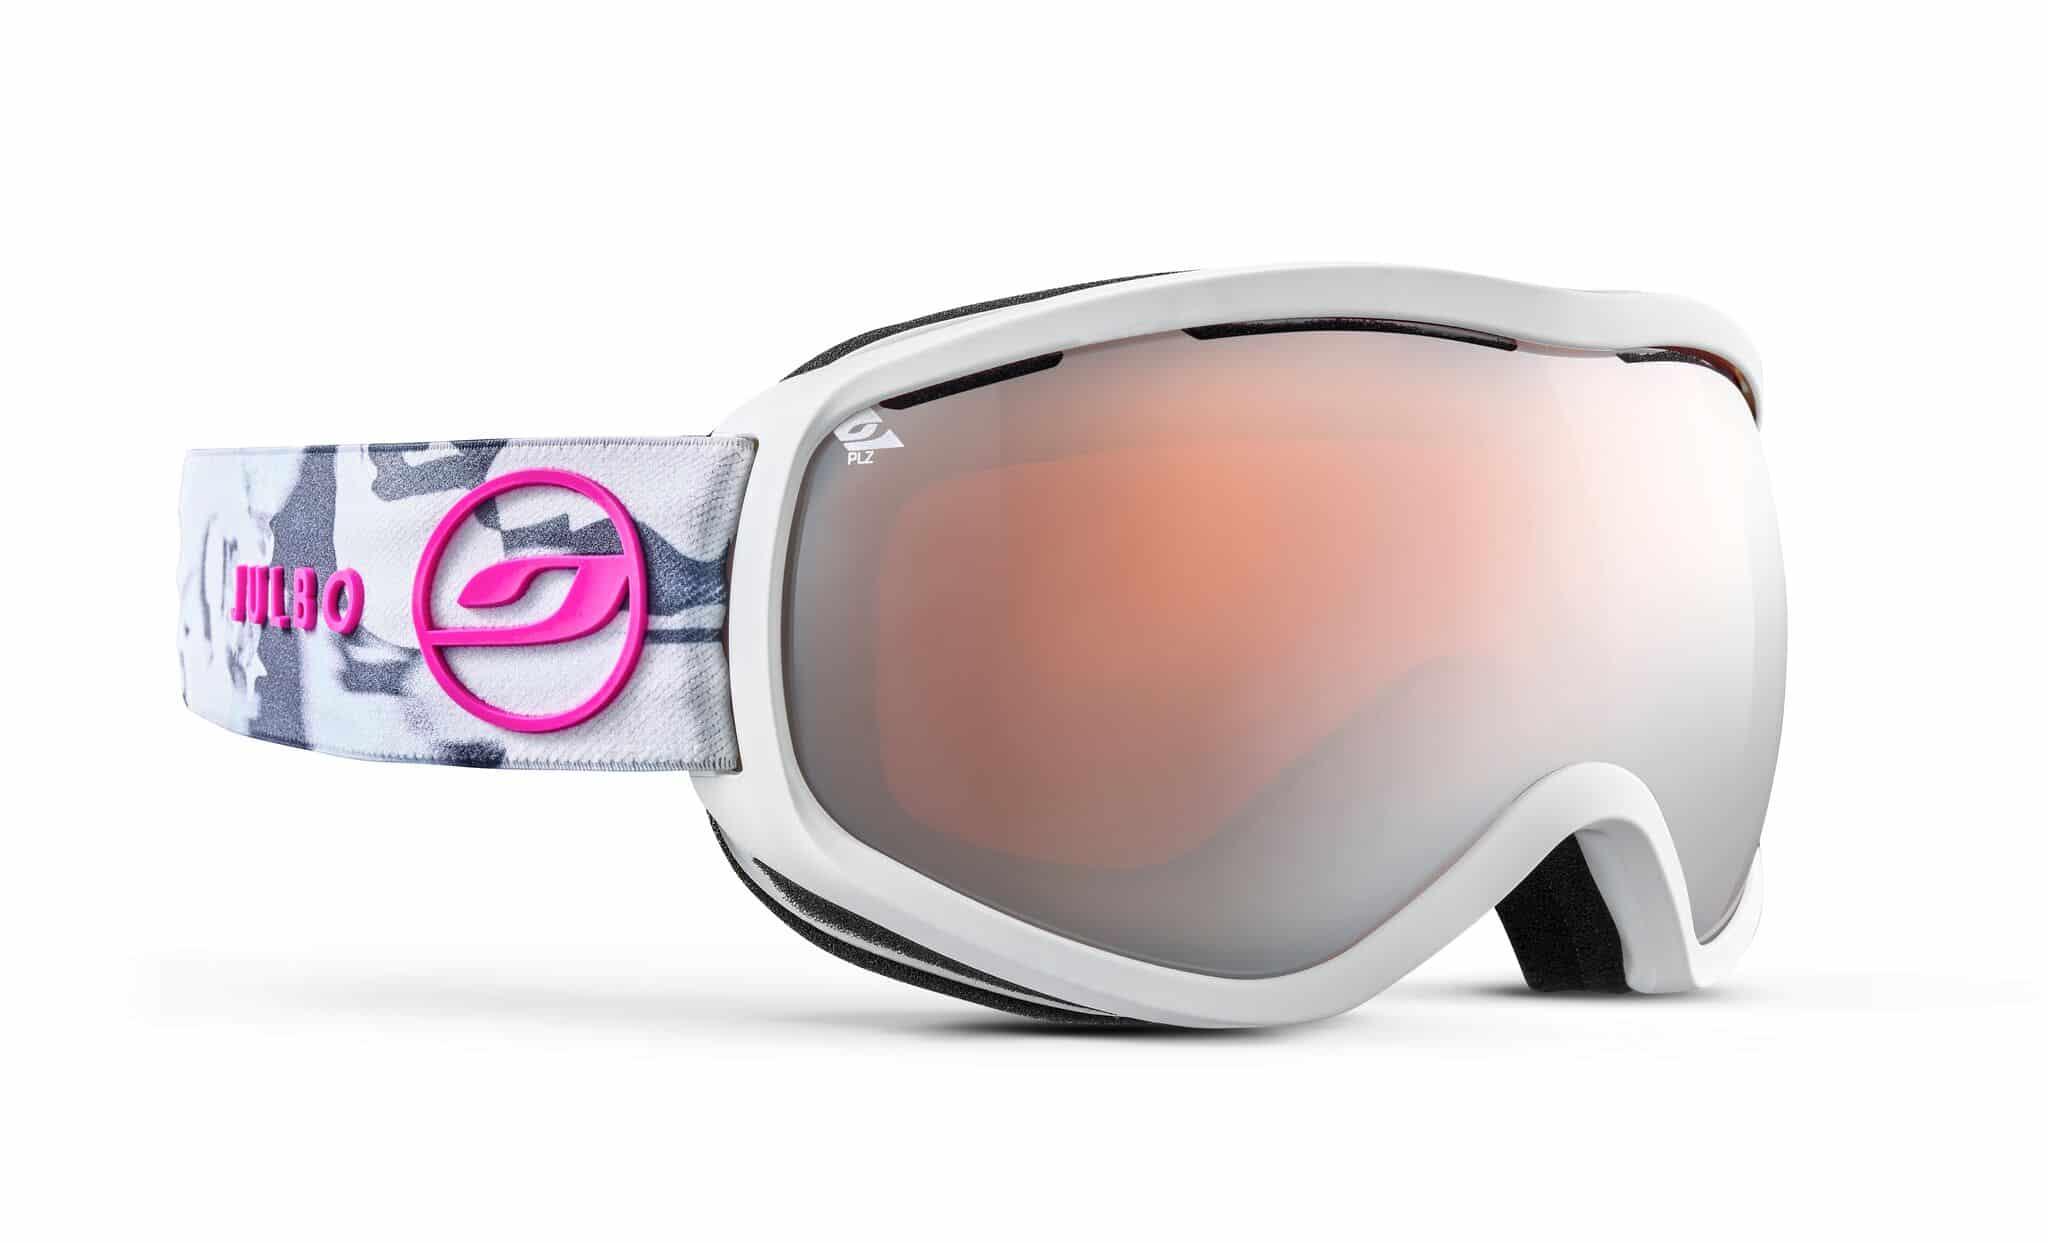 3aed6b98f45 Julbo Equinox J74991116 - Ski Goggles